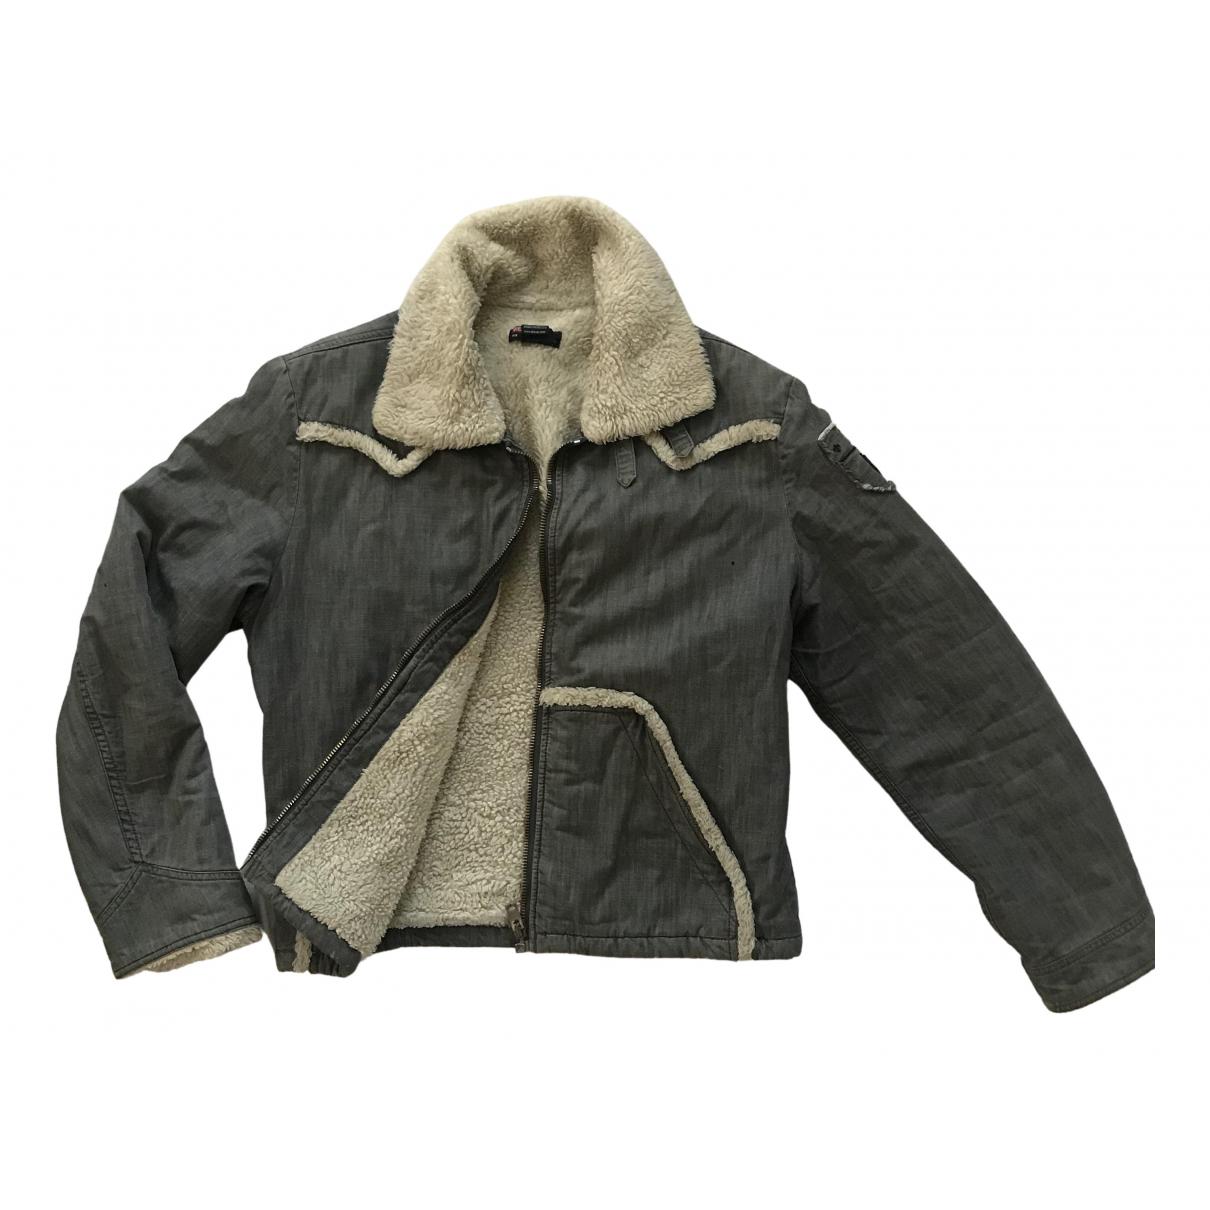 Diesel \N Grey Cotton jacket  for Men M International